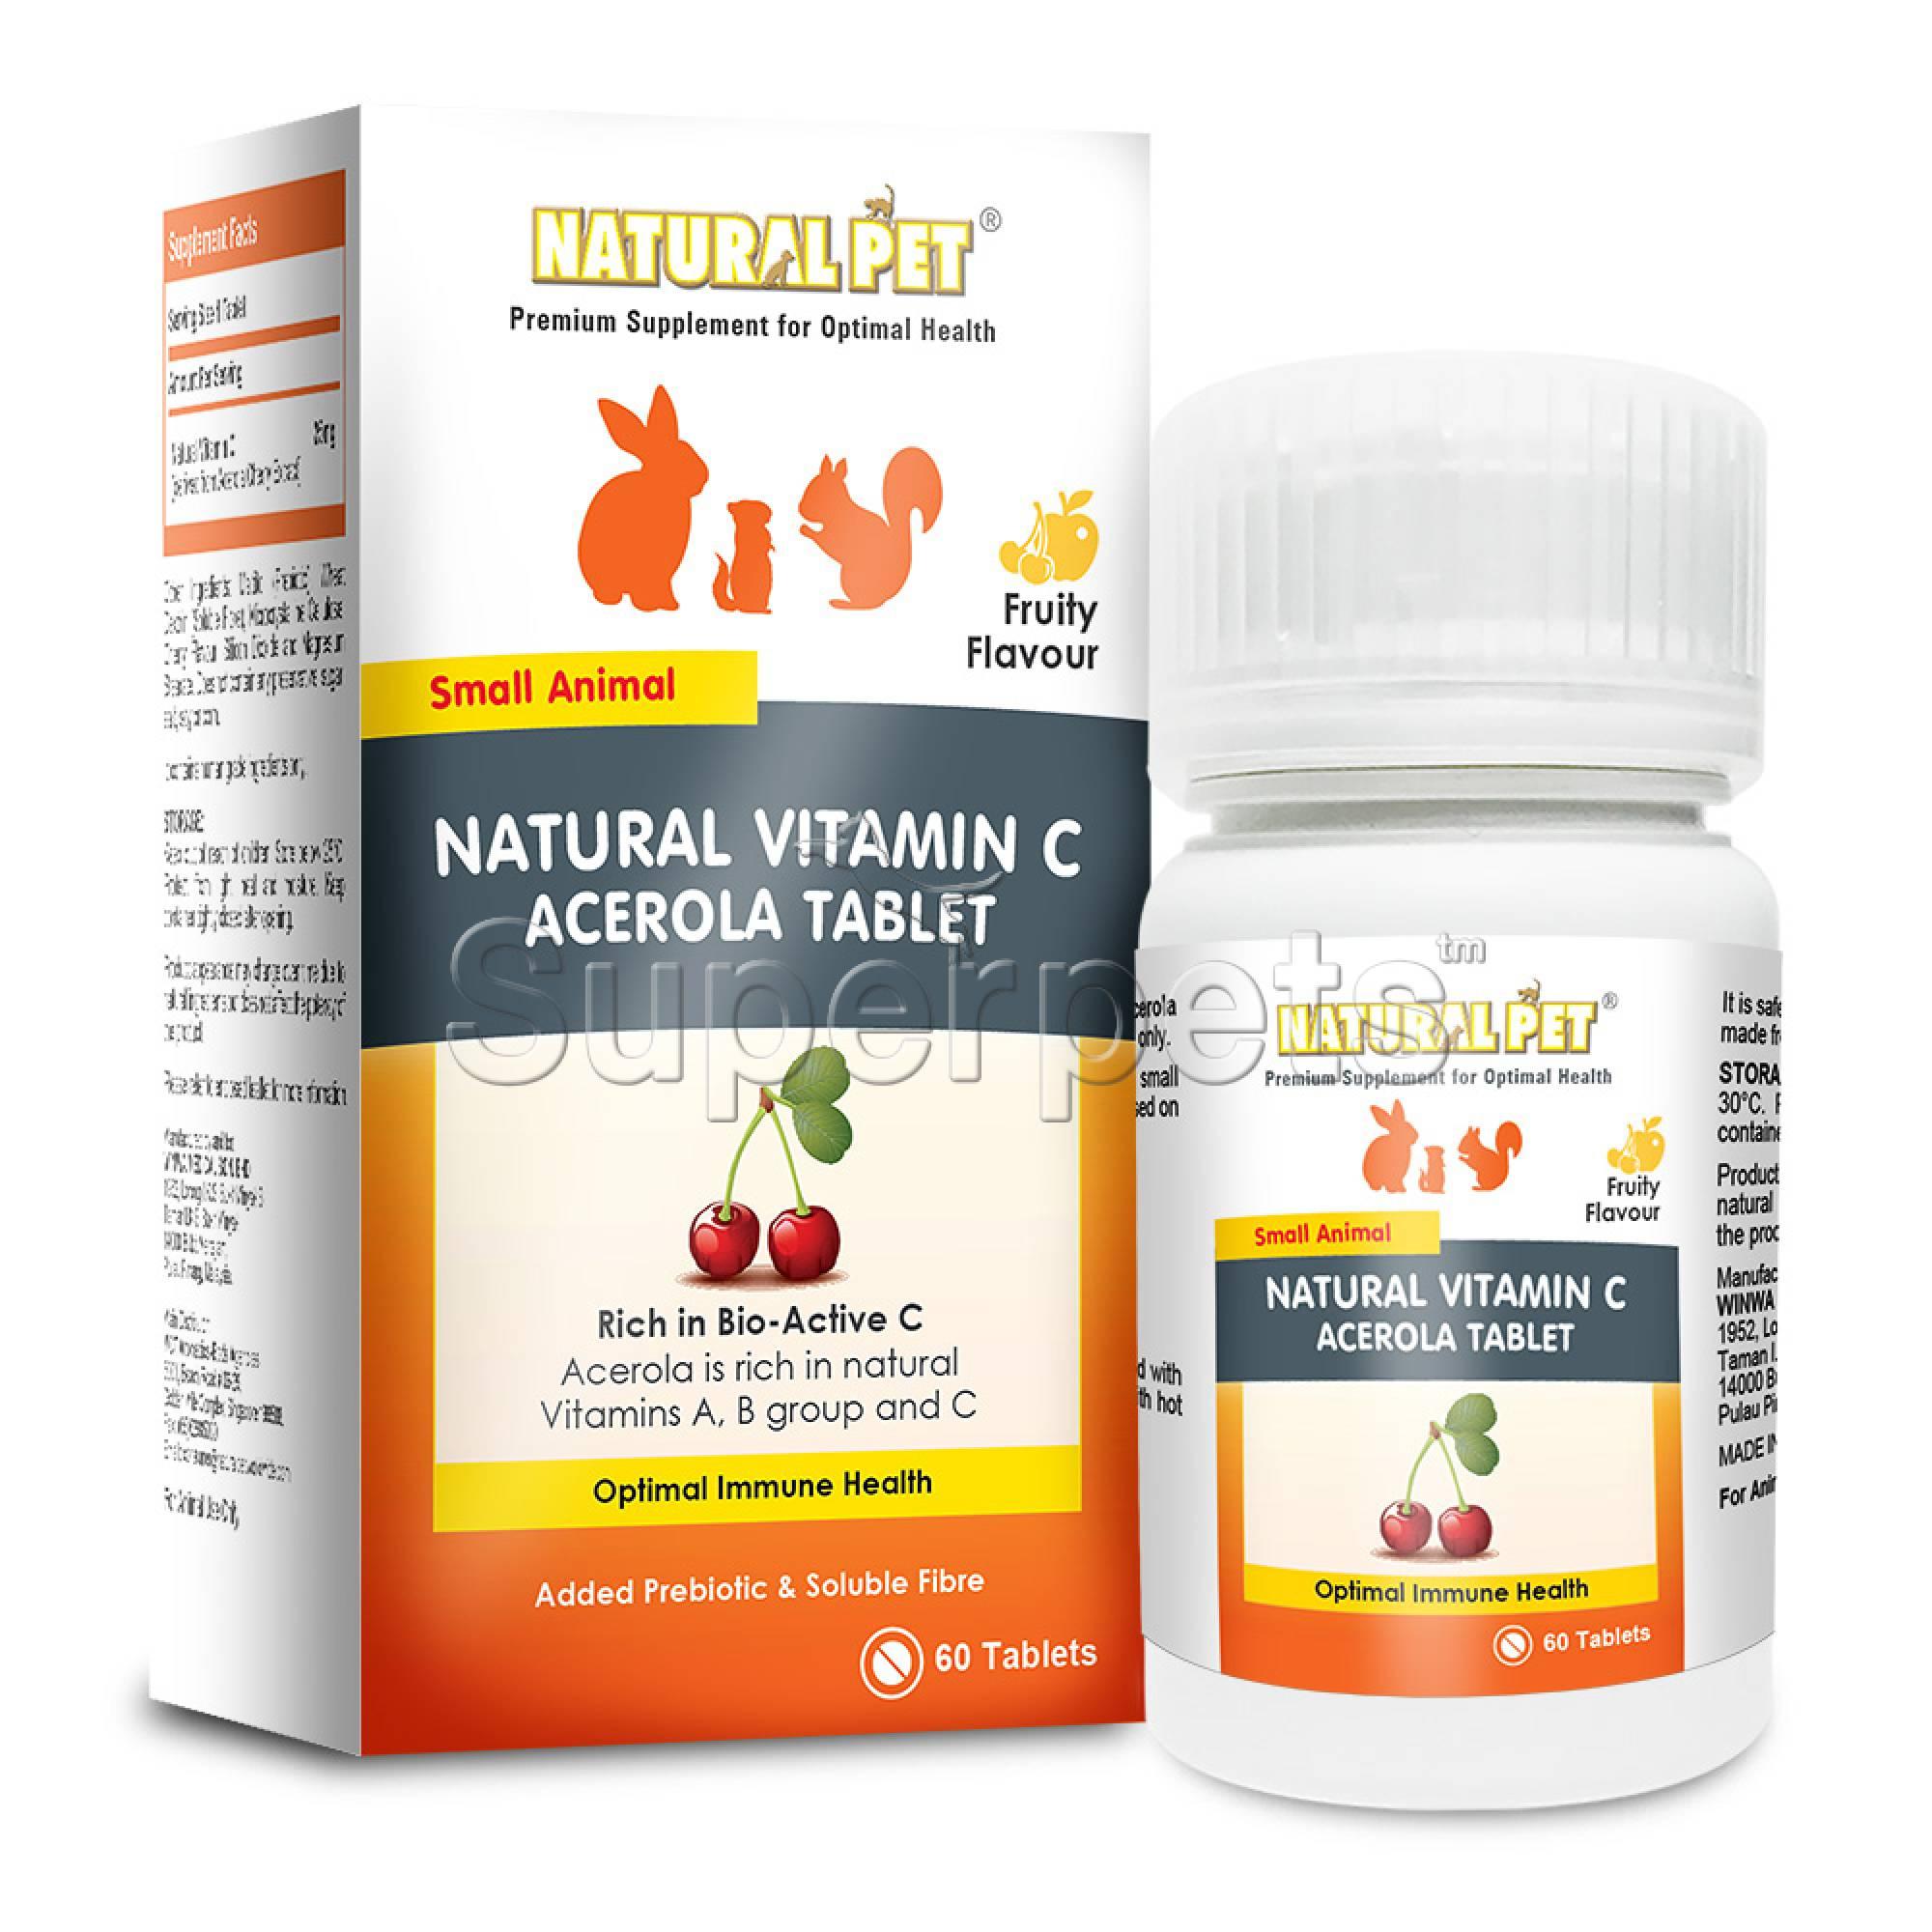 Natural Pet - Natural Vitamin C Acerola 60tabs